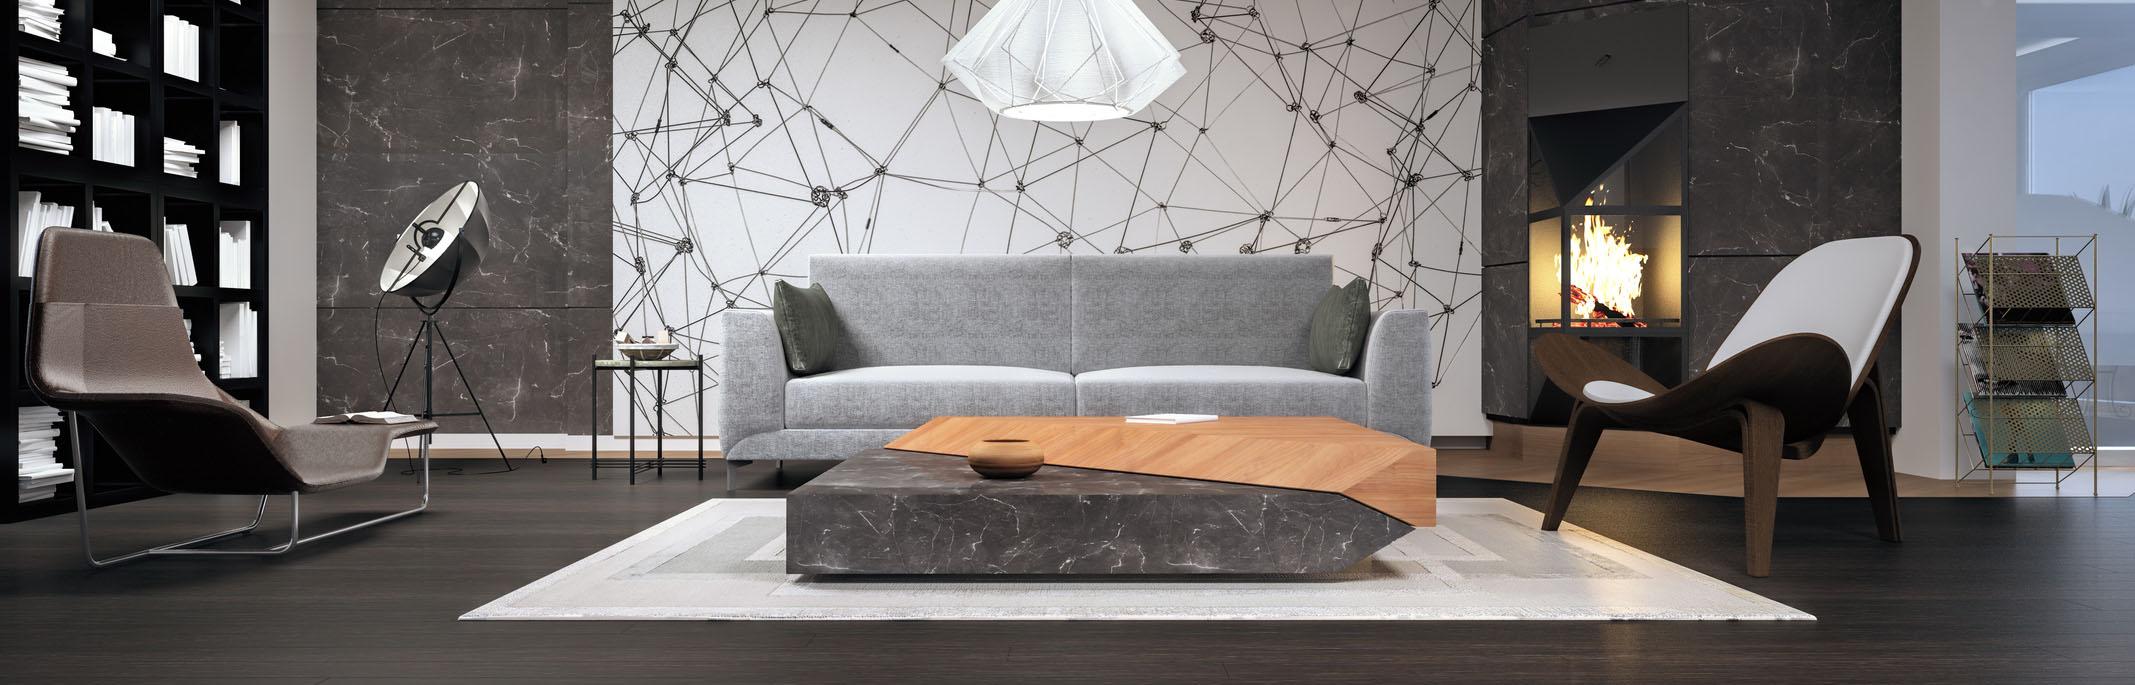 Bemyde - Interior  designers